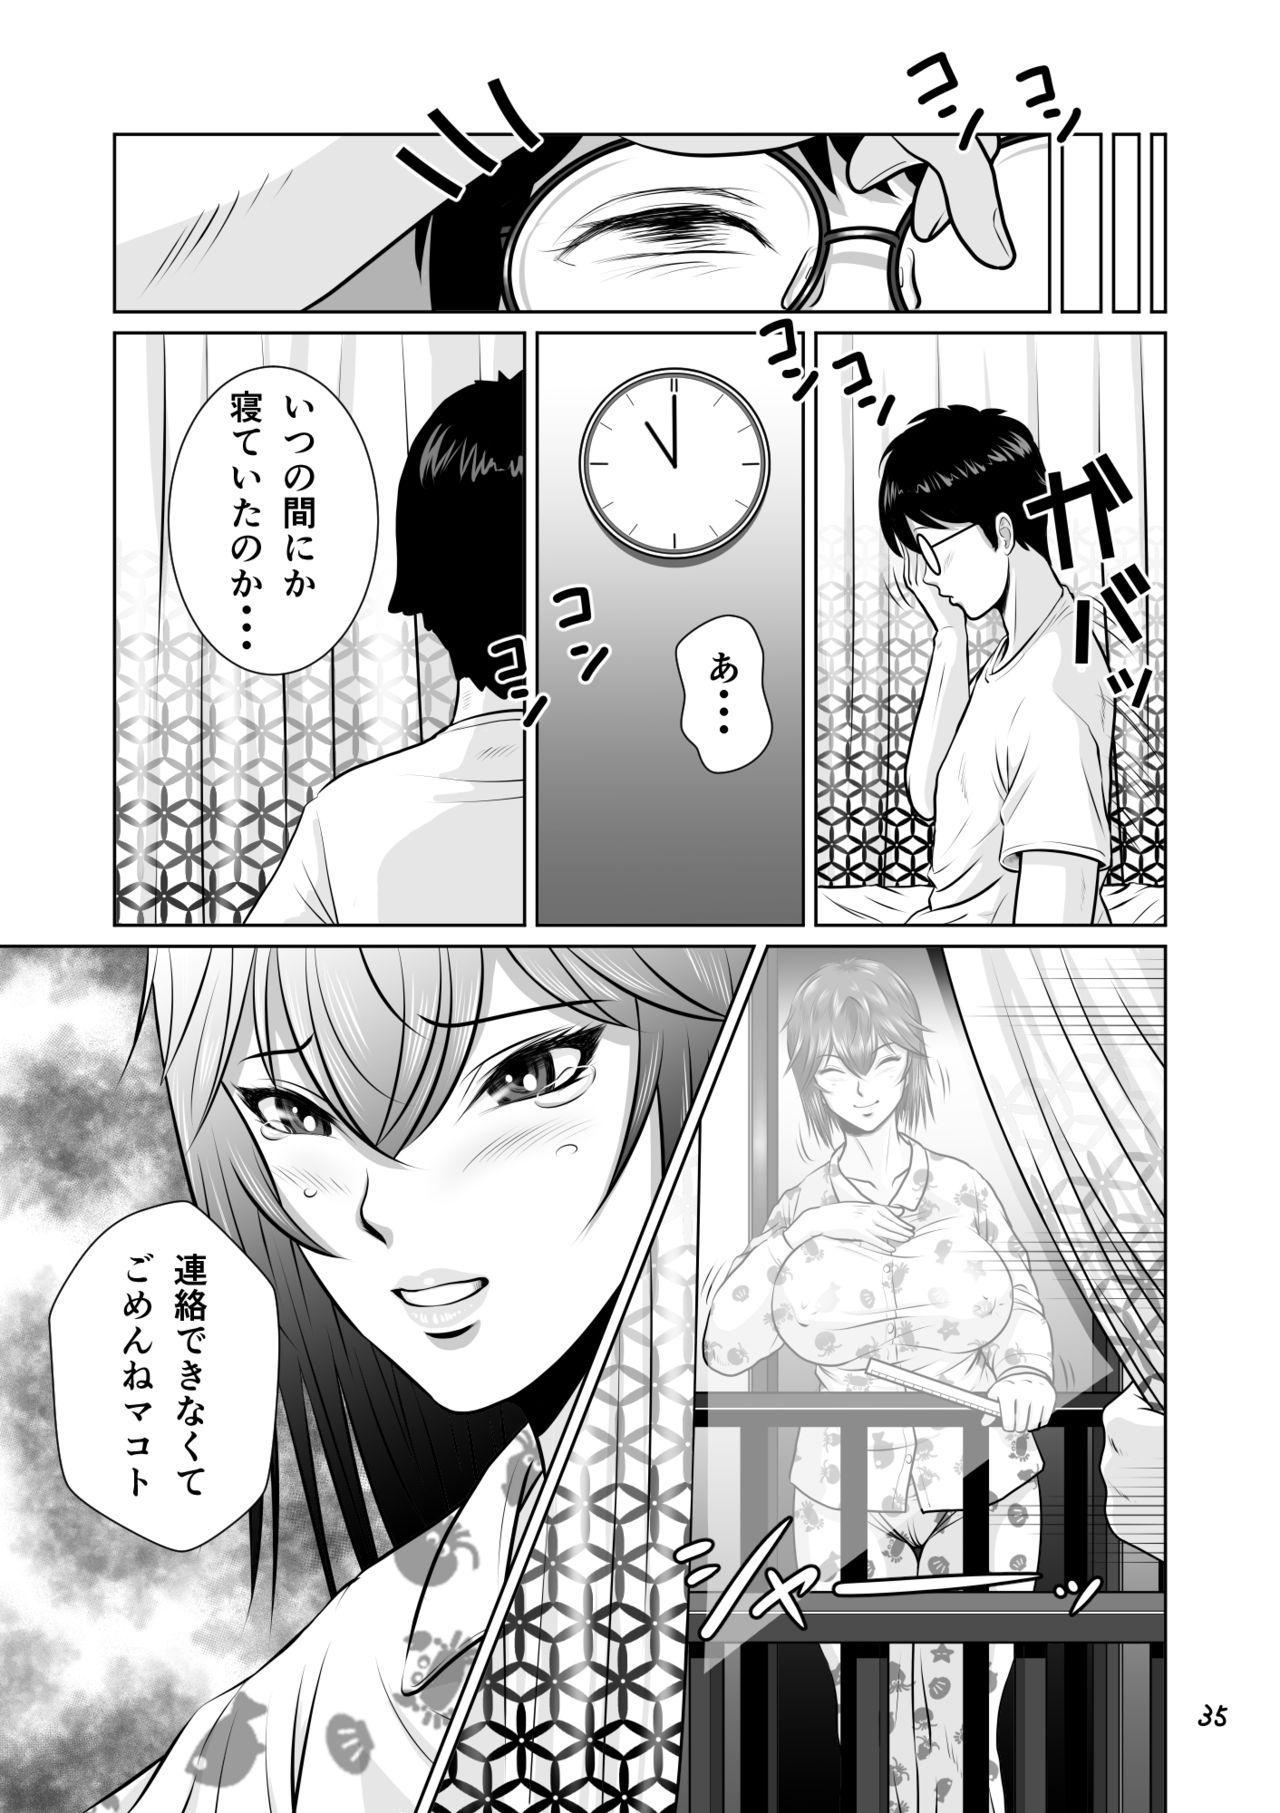 Netorare Osananajimi Haruka-chan Kiki Ippatsu!! 35